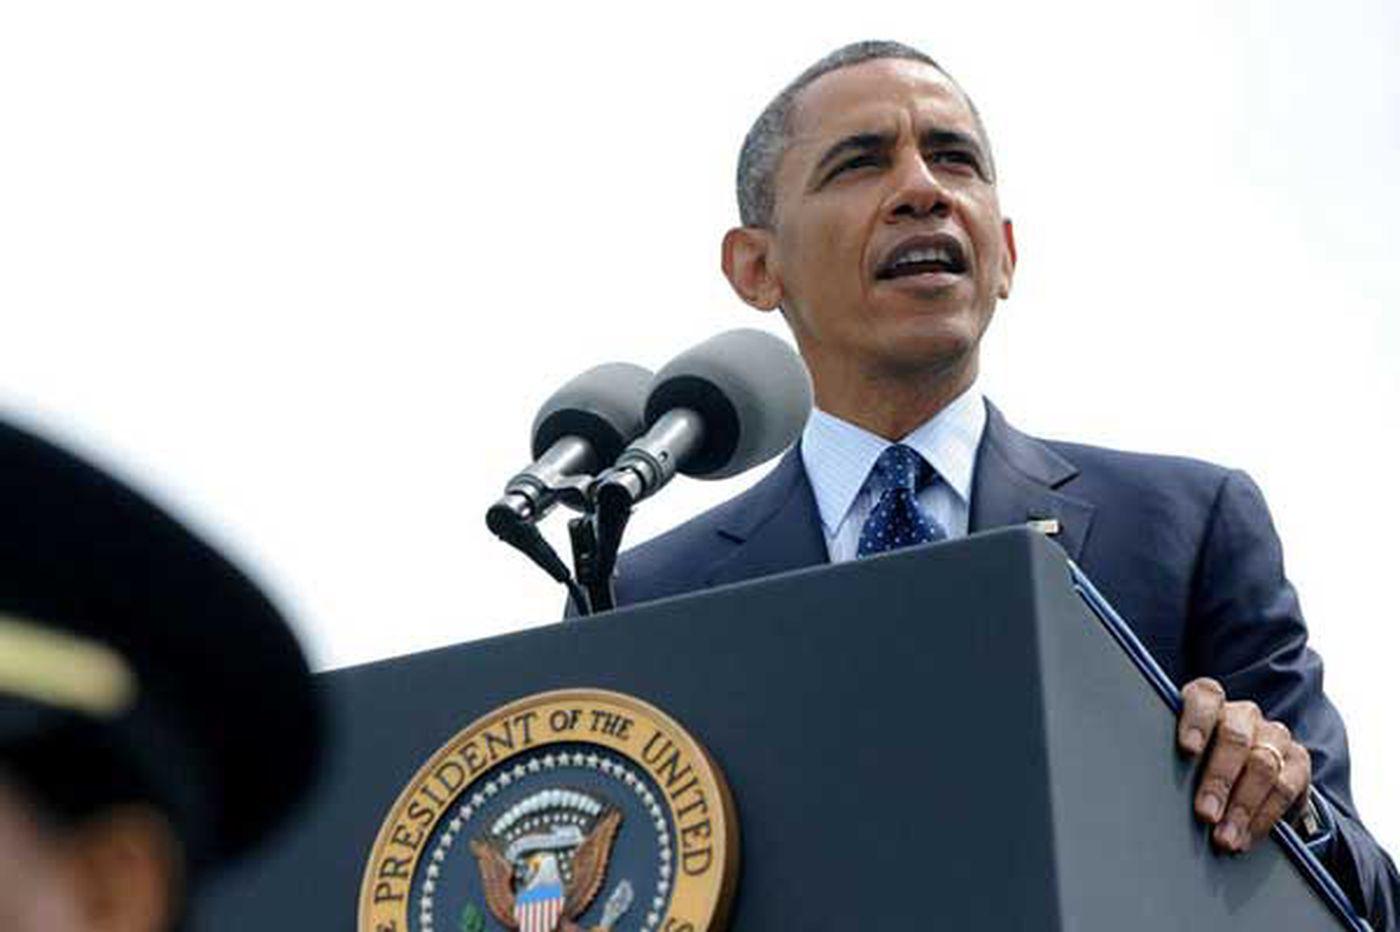 Obama honors slain Montco police officer